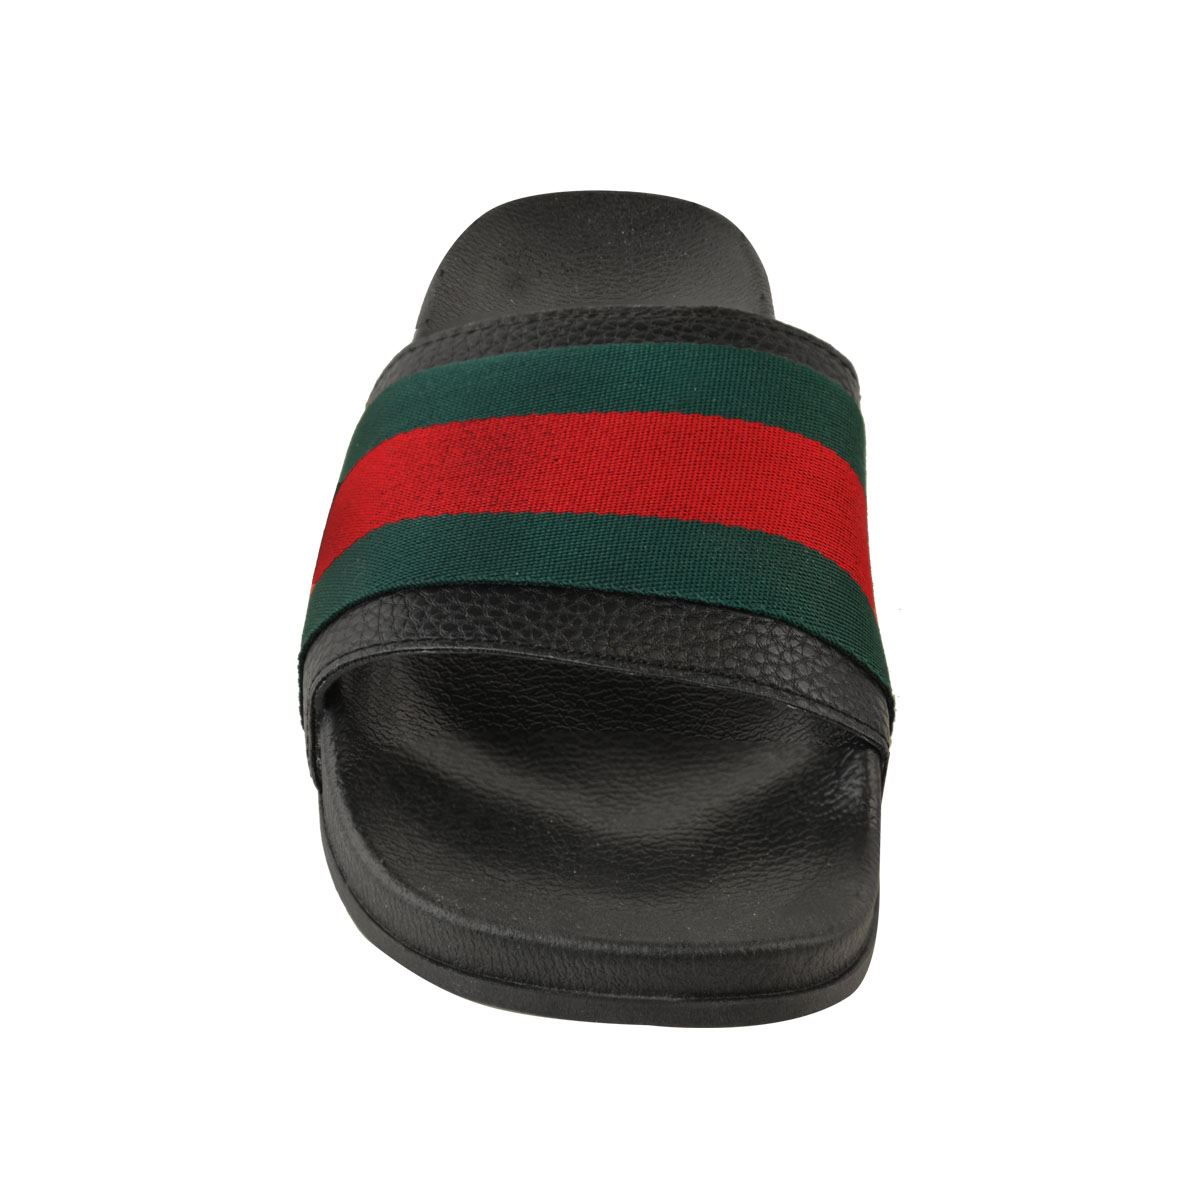 Womens-Ladies-Designer-Inspired-Celebrity-Red-Green-Striped-Slider-Sandals-Shoes thumbnail 6